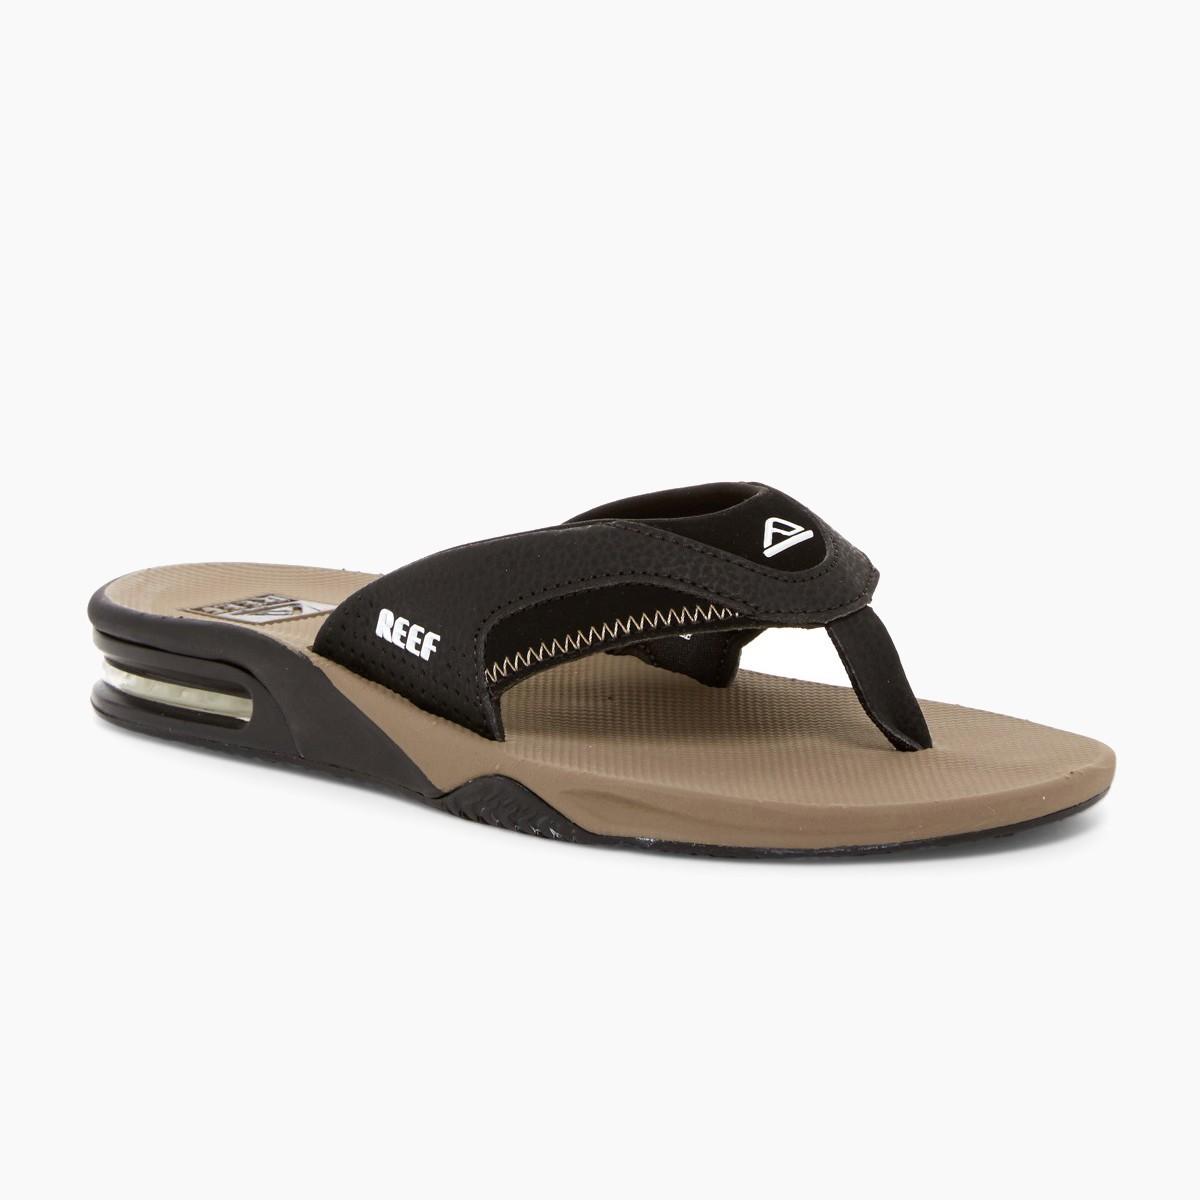 Reef Fanning Waterproof Churchkey Sandals (Men's)